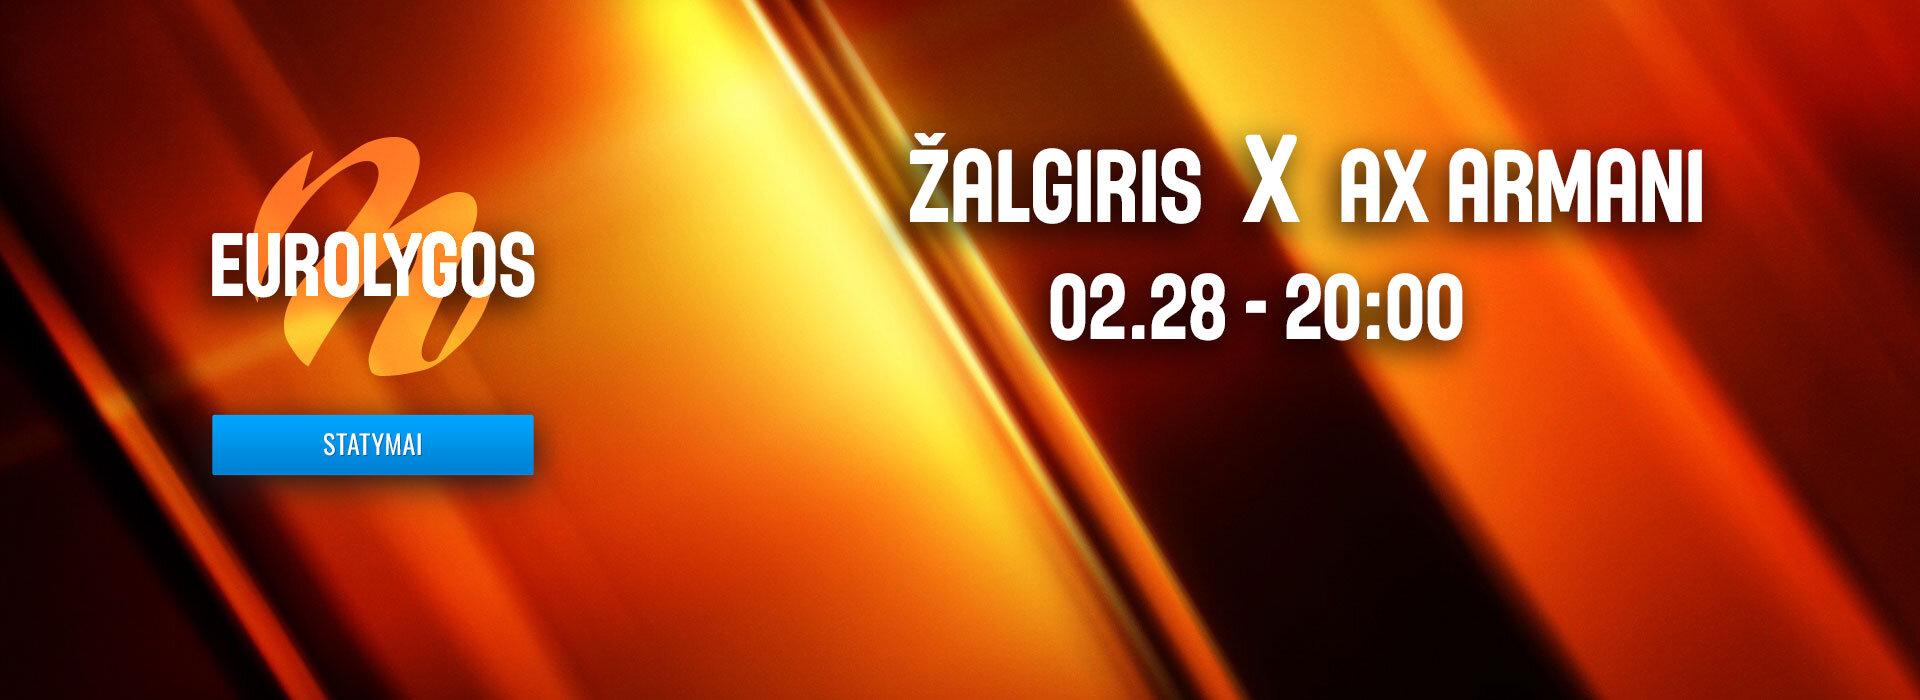 EUROLYGA_Zalgiris